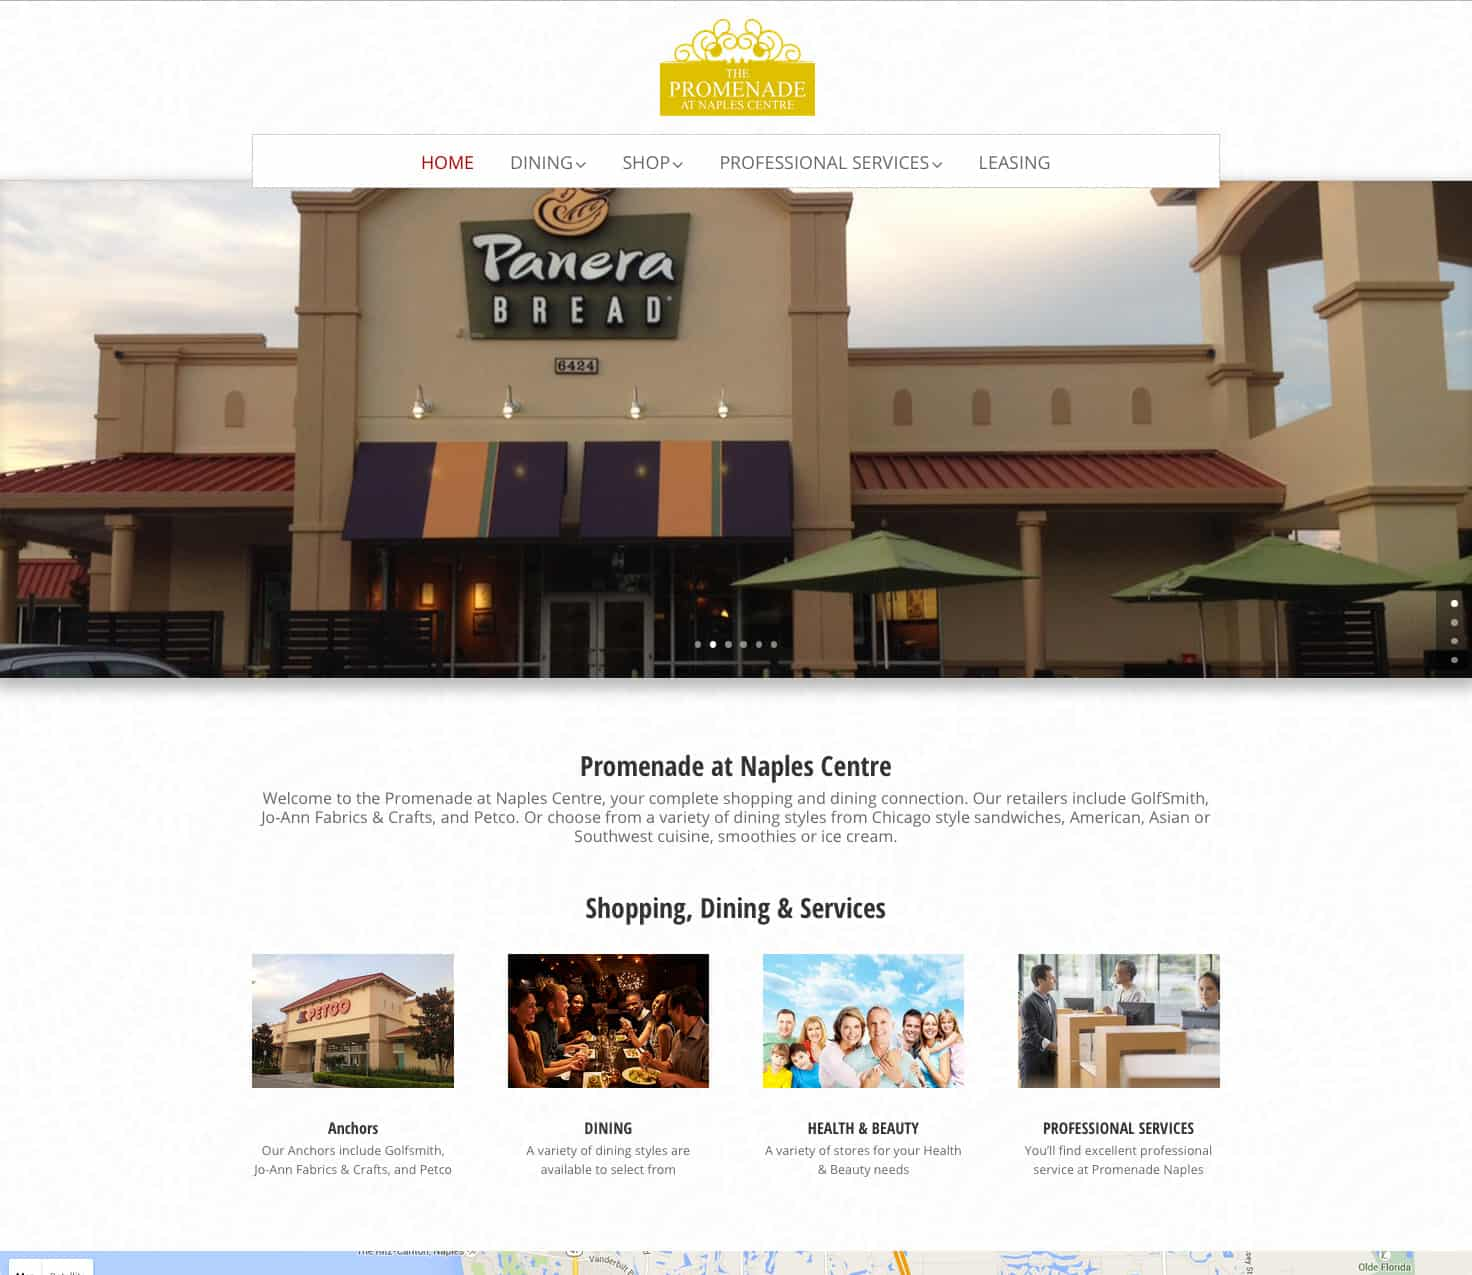 promenadeatnaplescentre.com home page